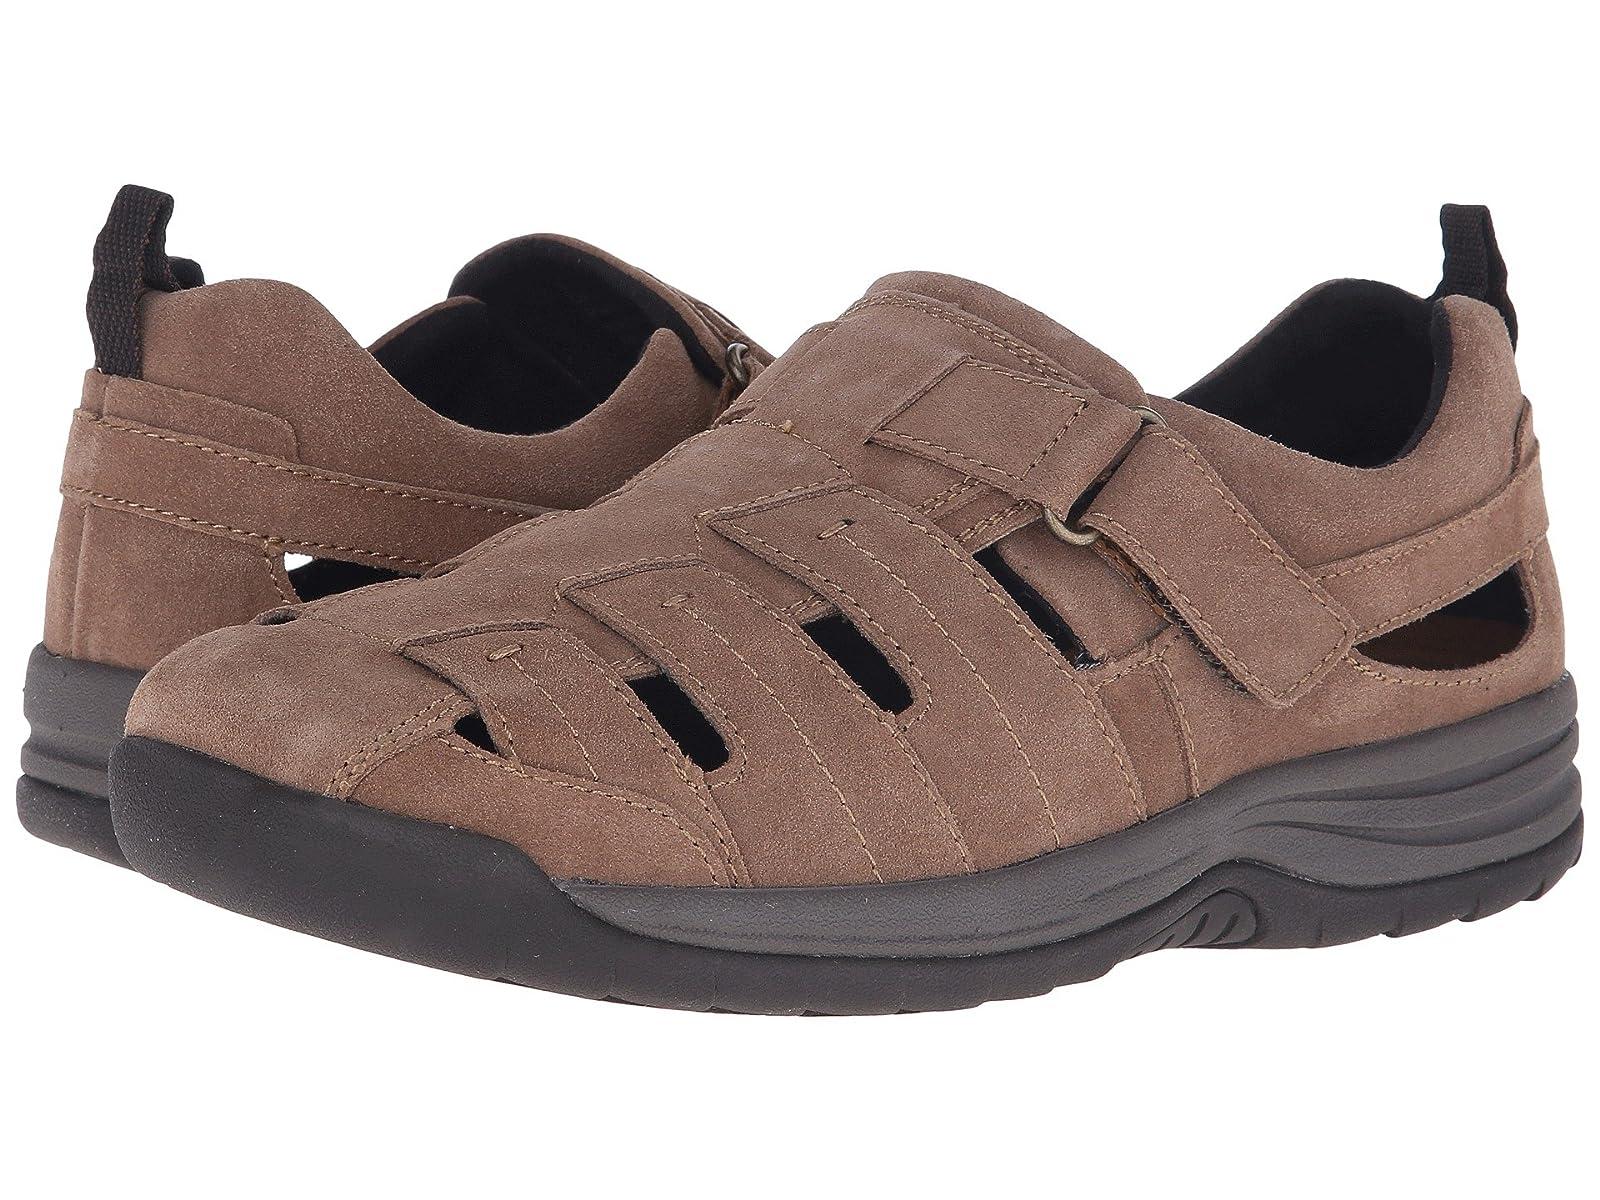 Drew DublinComfortable and distinctive shoes